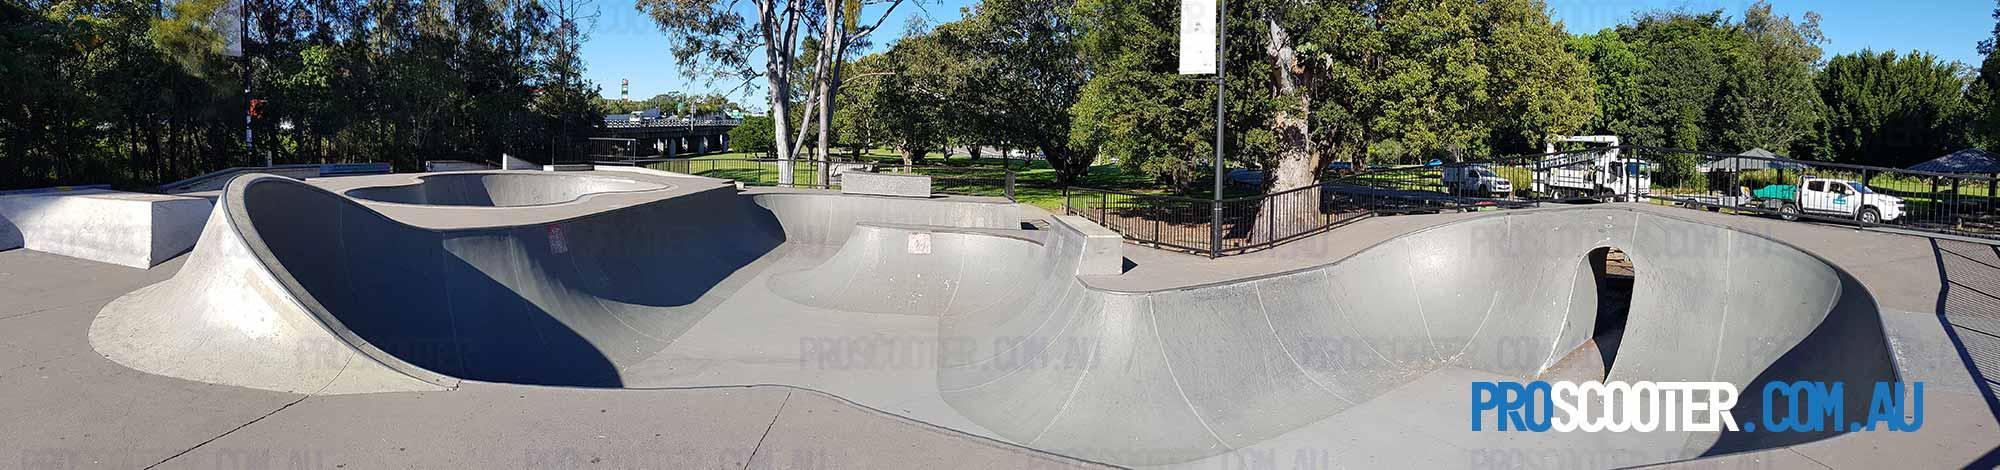 Nerang Skate Park Cradle